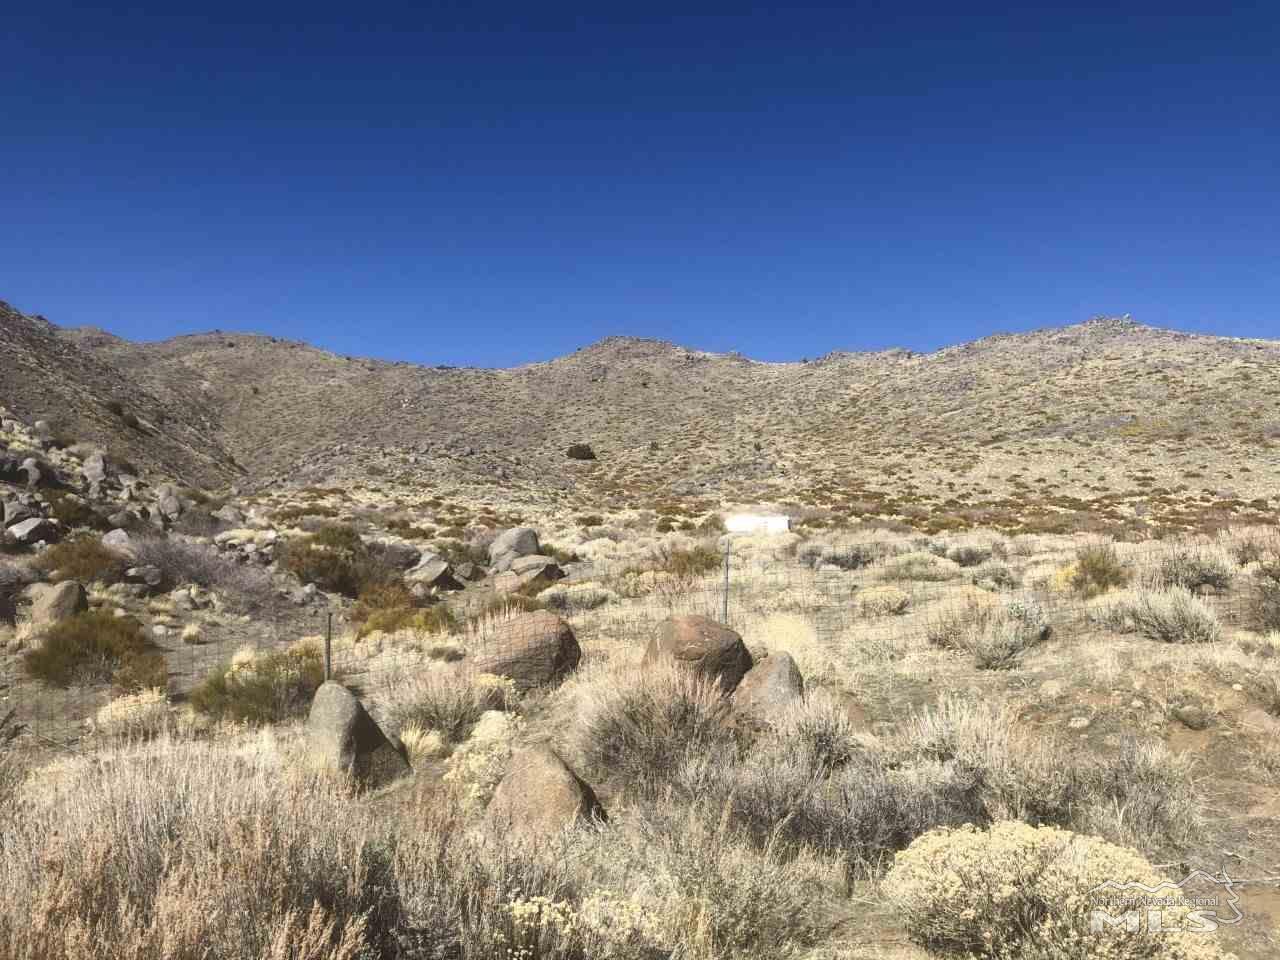 Image for 1305 Freds Mountain, Reno, NV 89508-7334